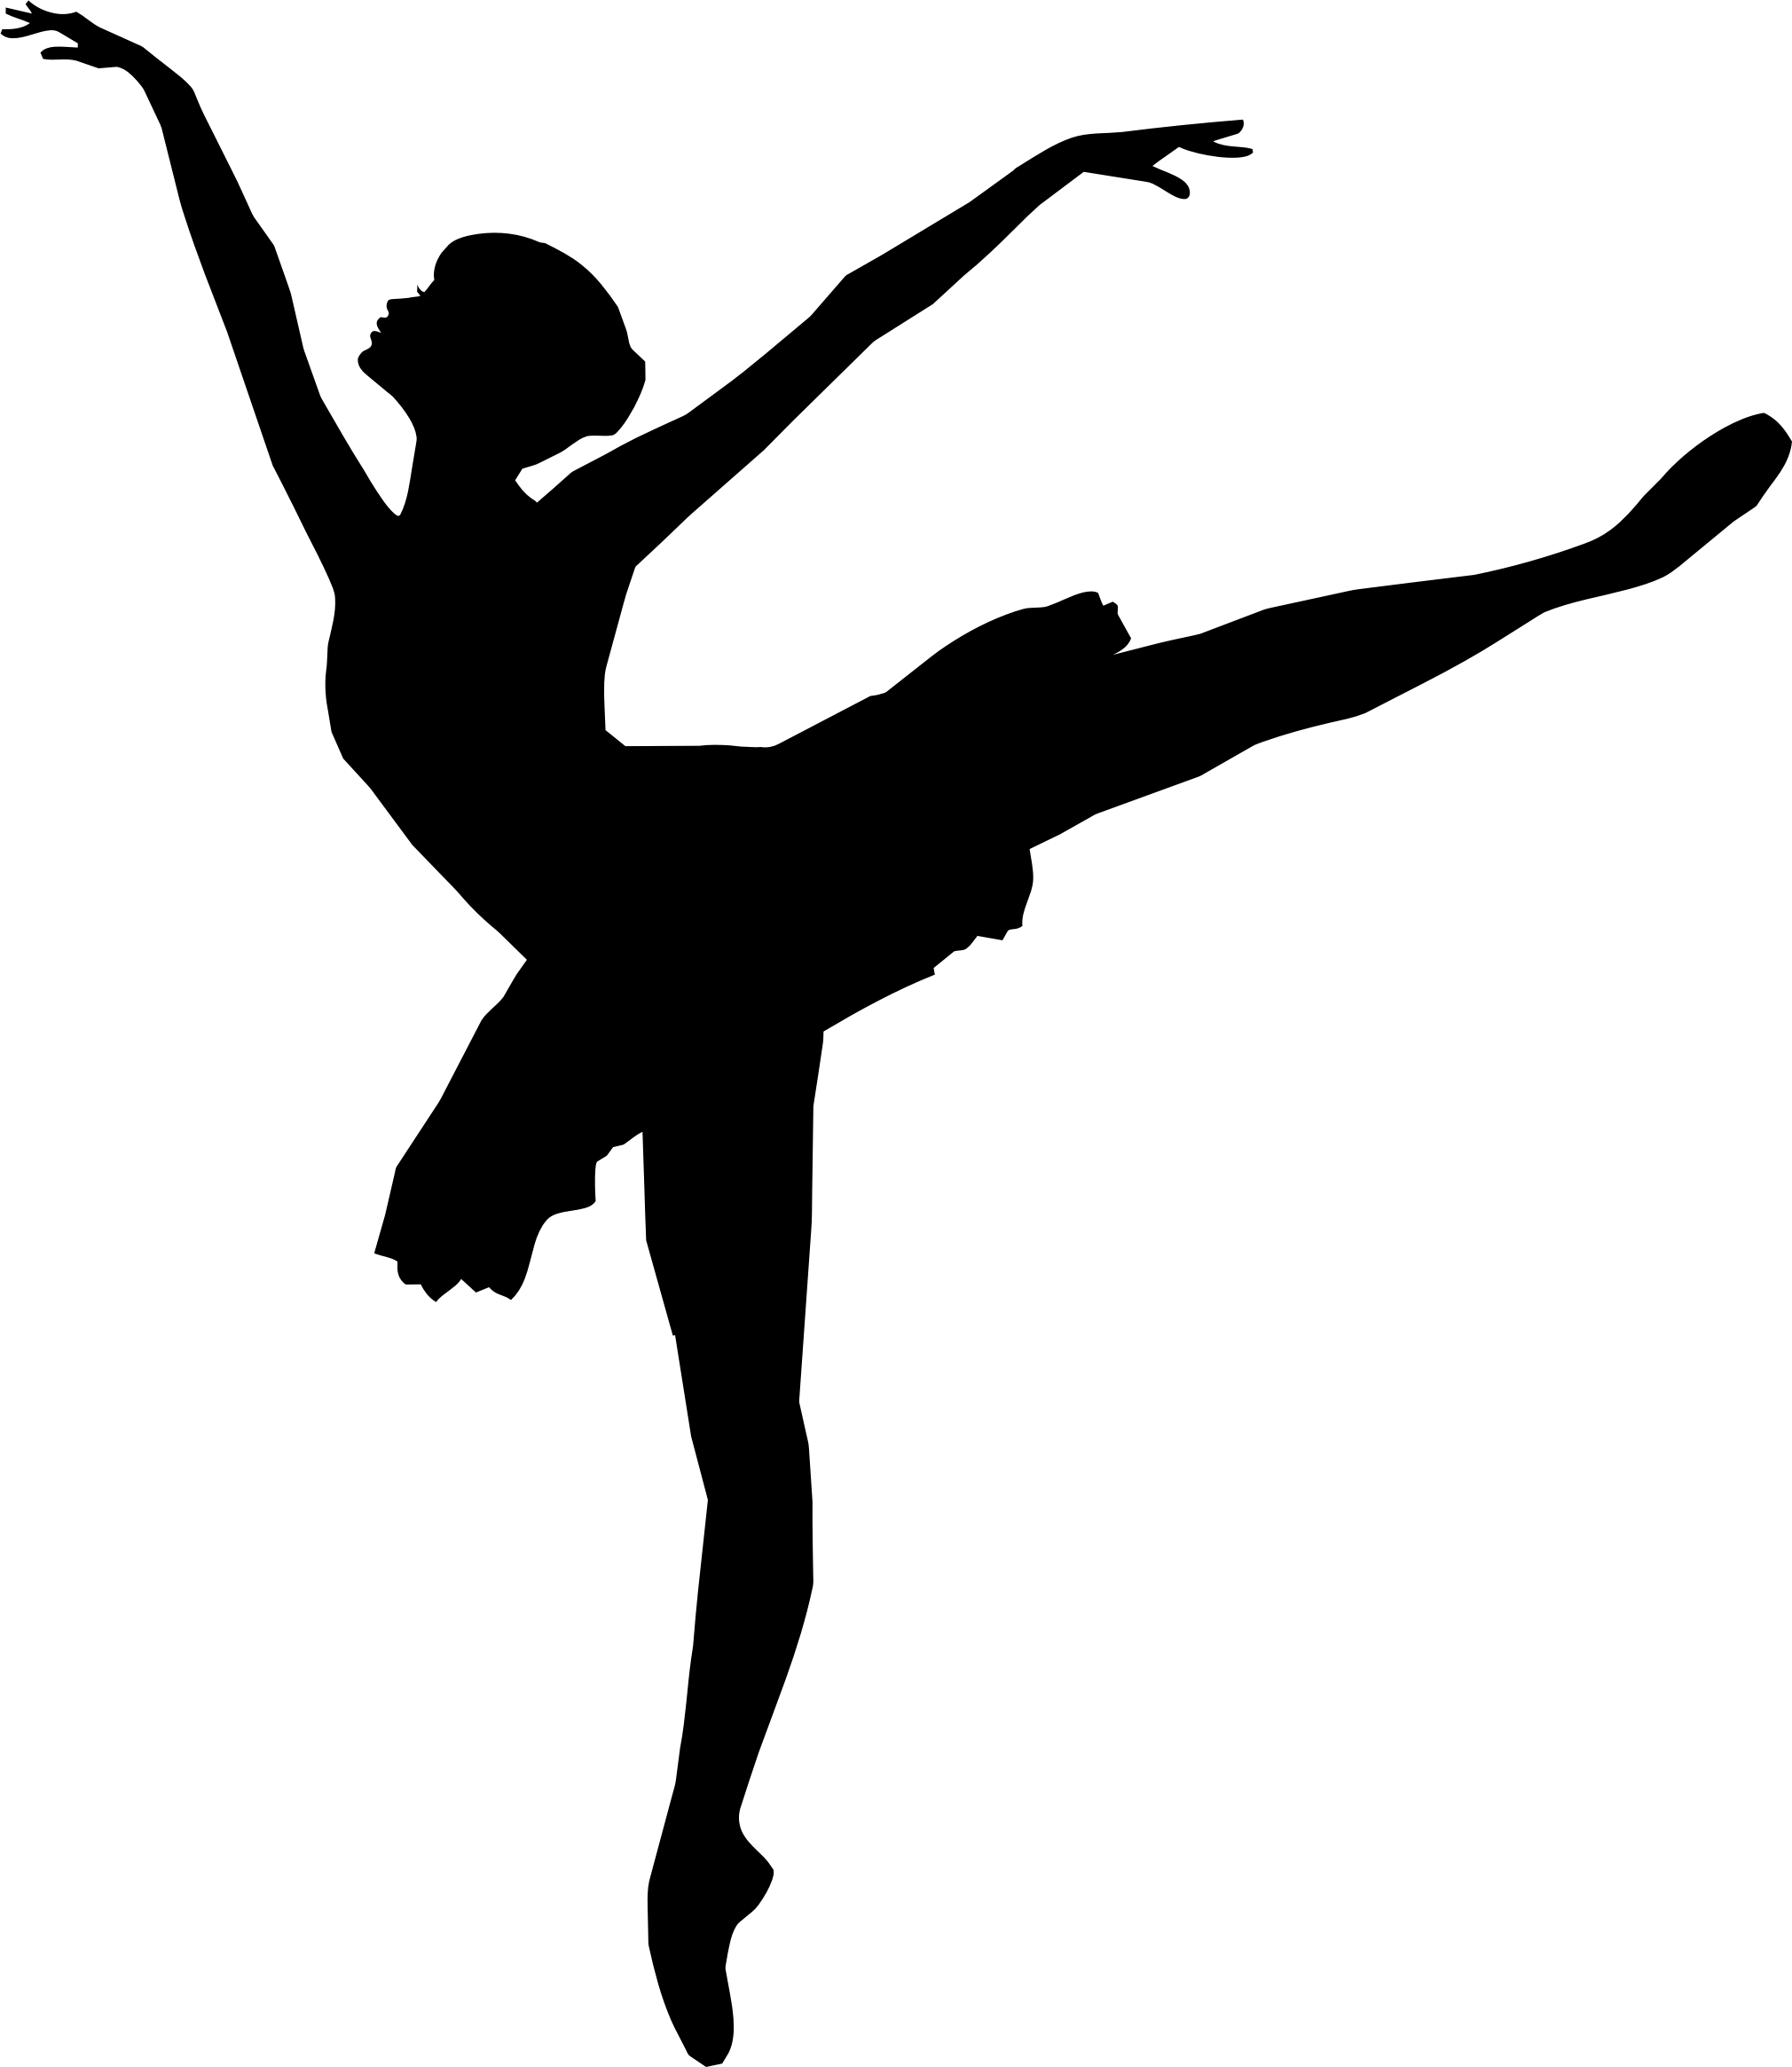 2020x2330 Clipart